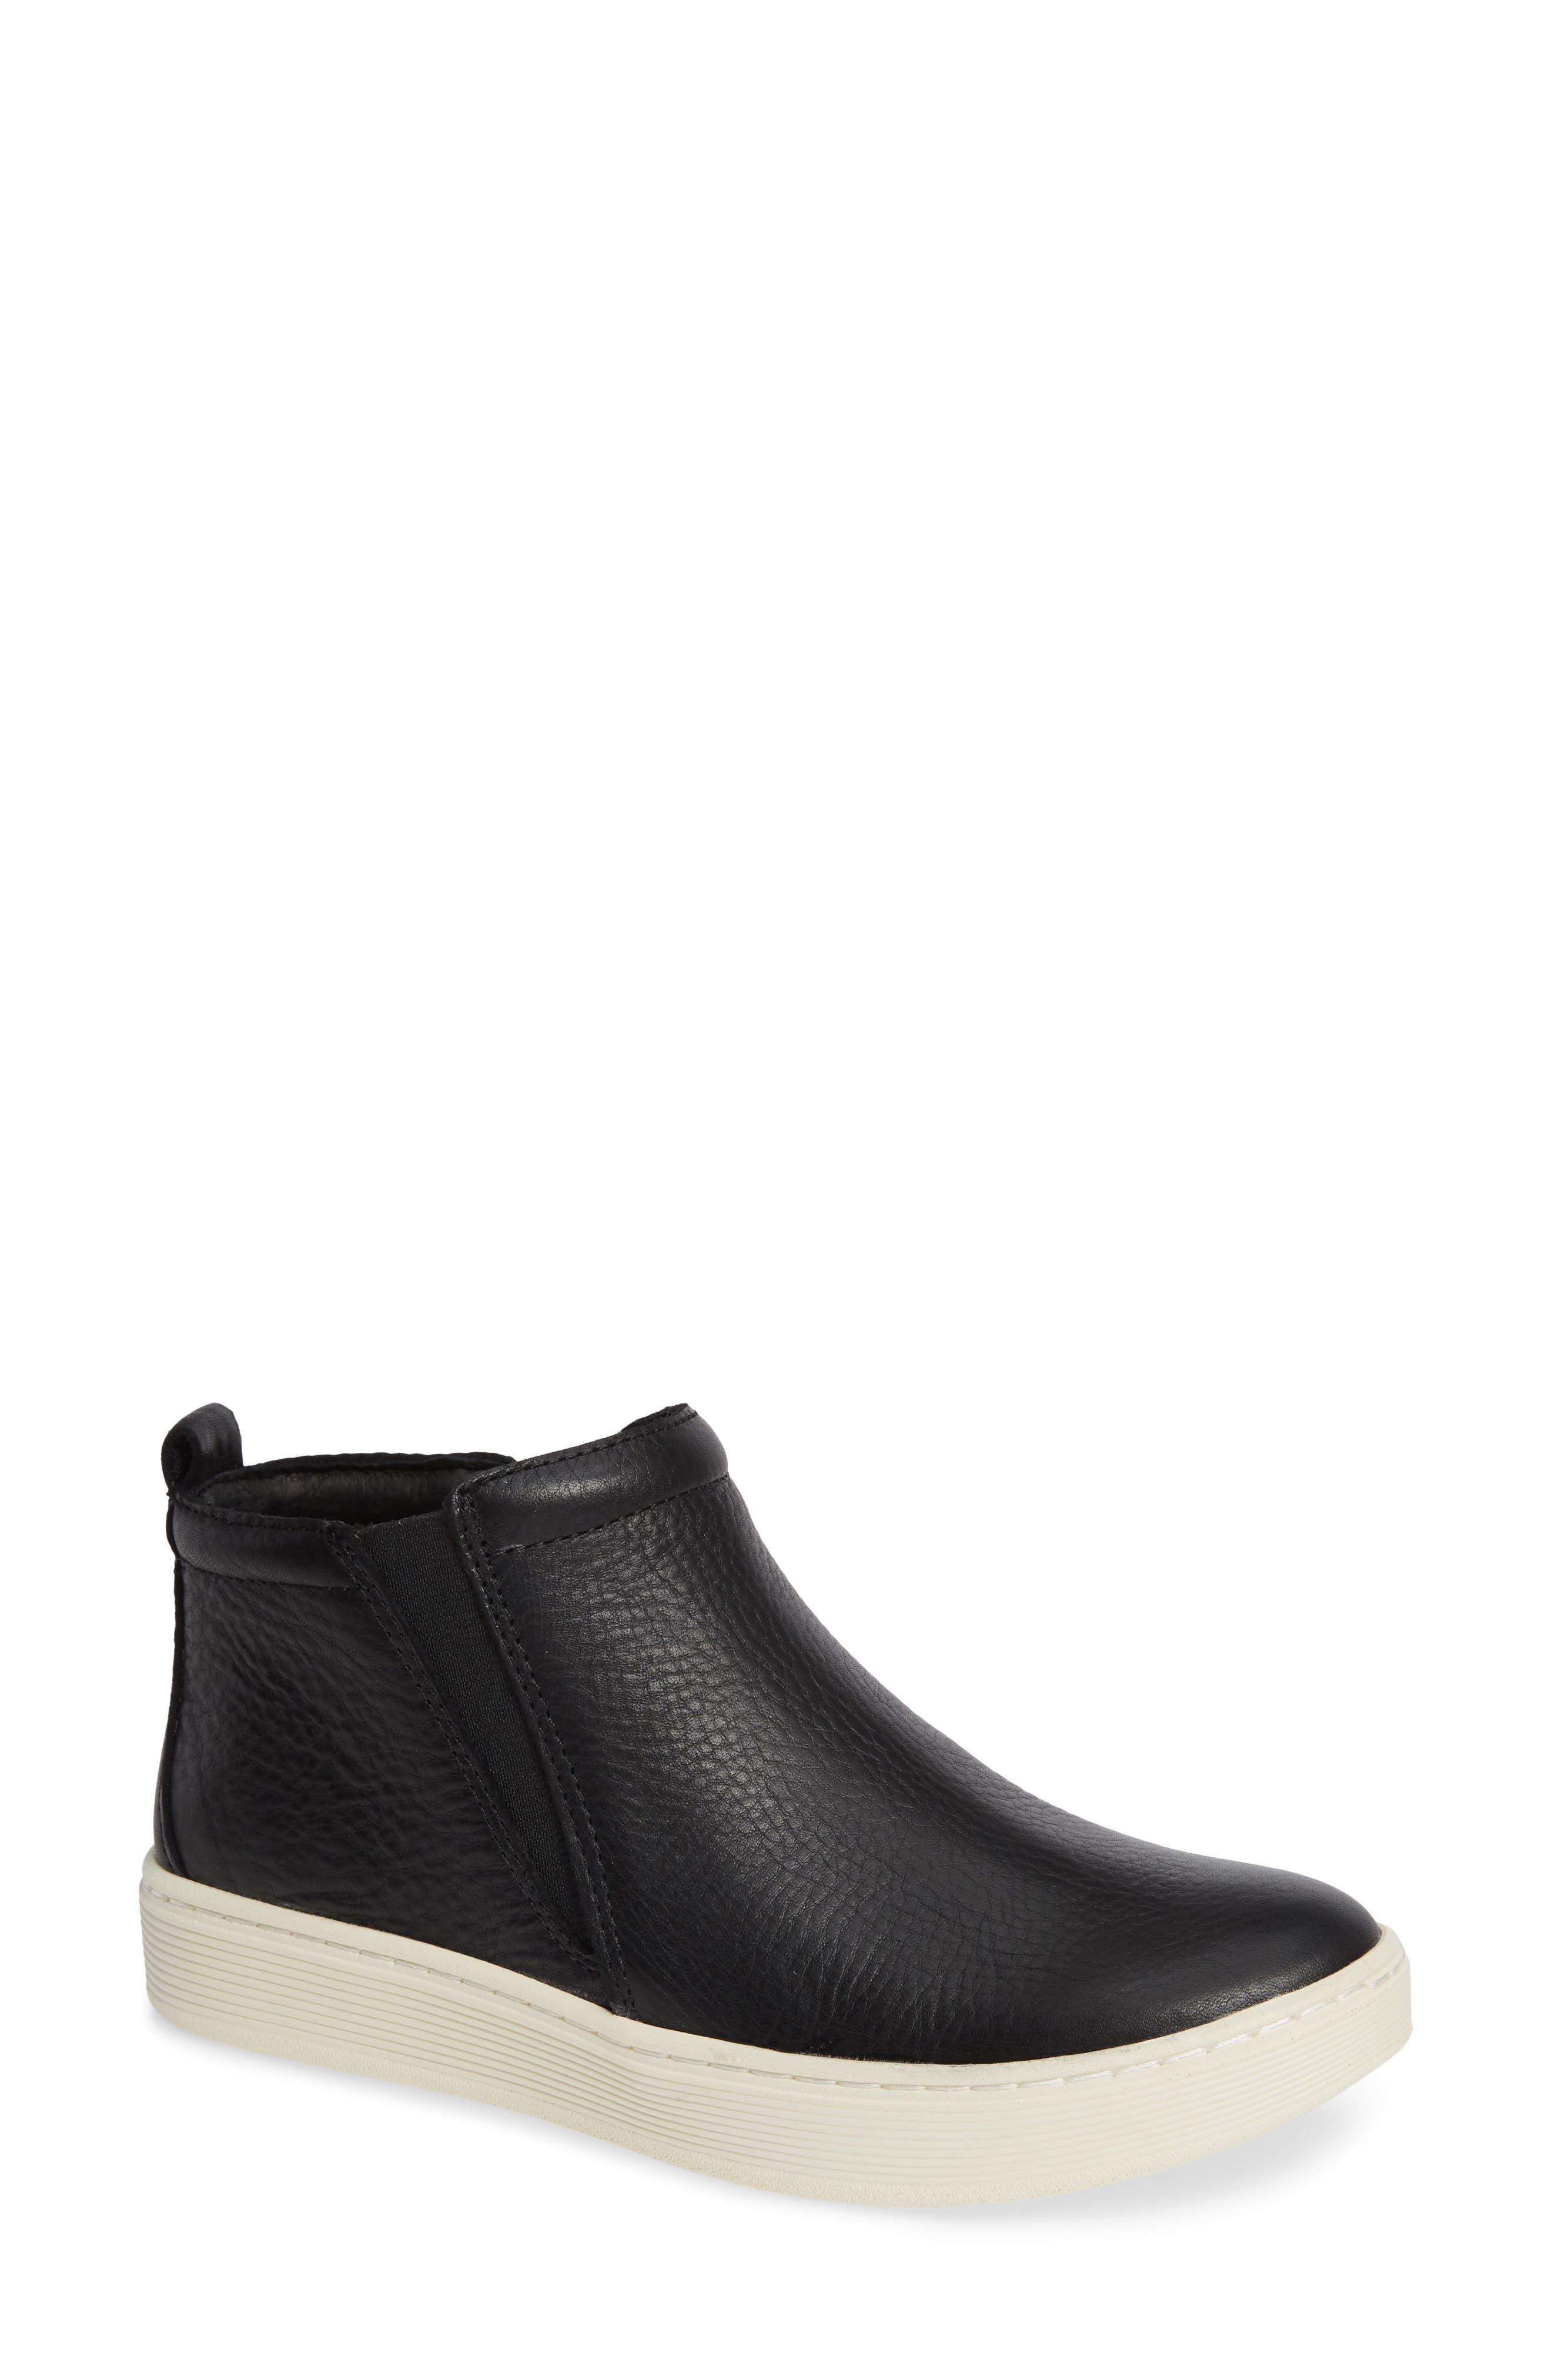 SÖFFT, Britton II Waterproof Sneaker Bootie, Main thumbnail 1, color, BLACK LEATHER